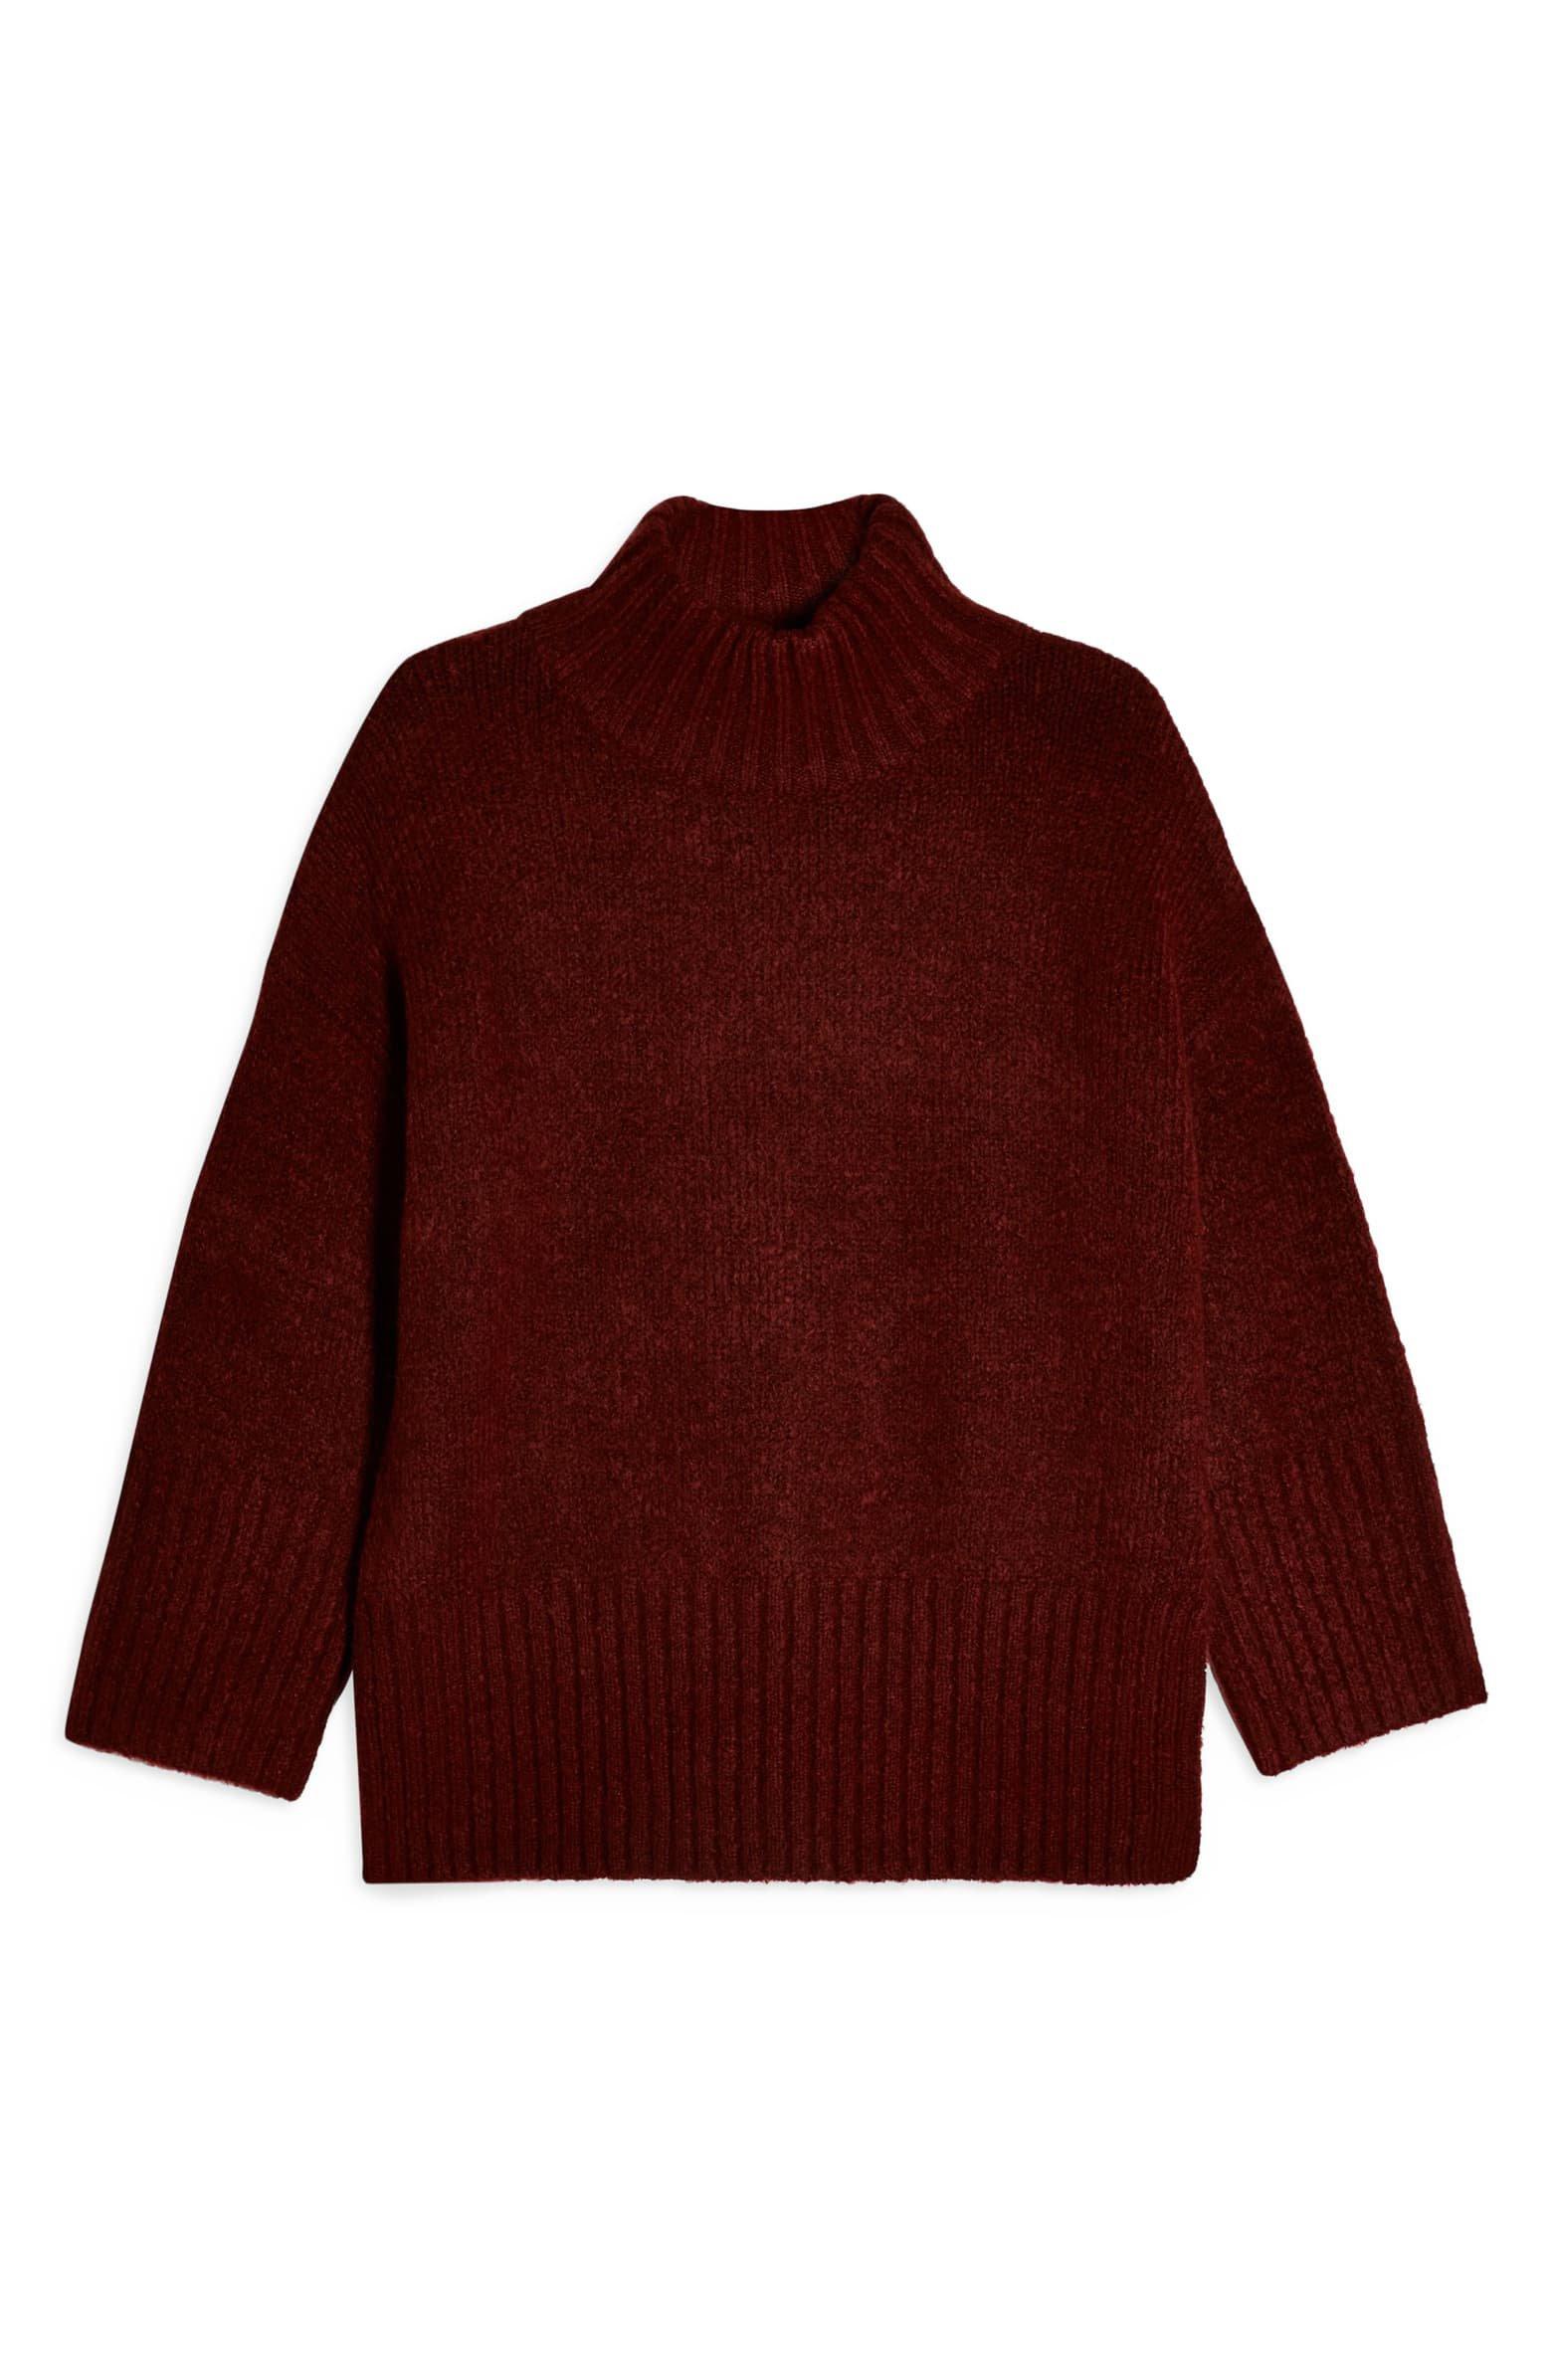 Topshop Funnel Neck Sweater (Petite)   Nordstrom